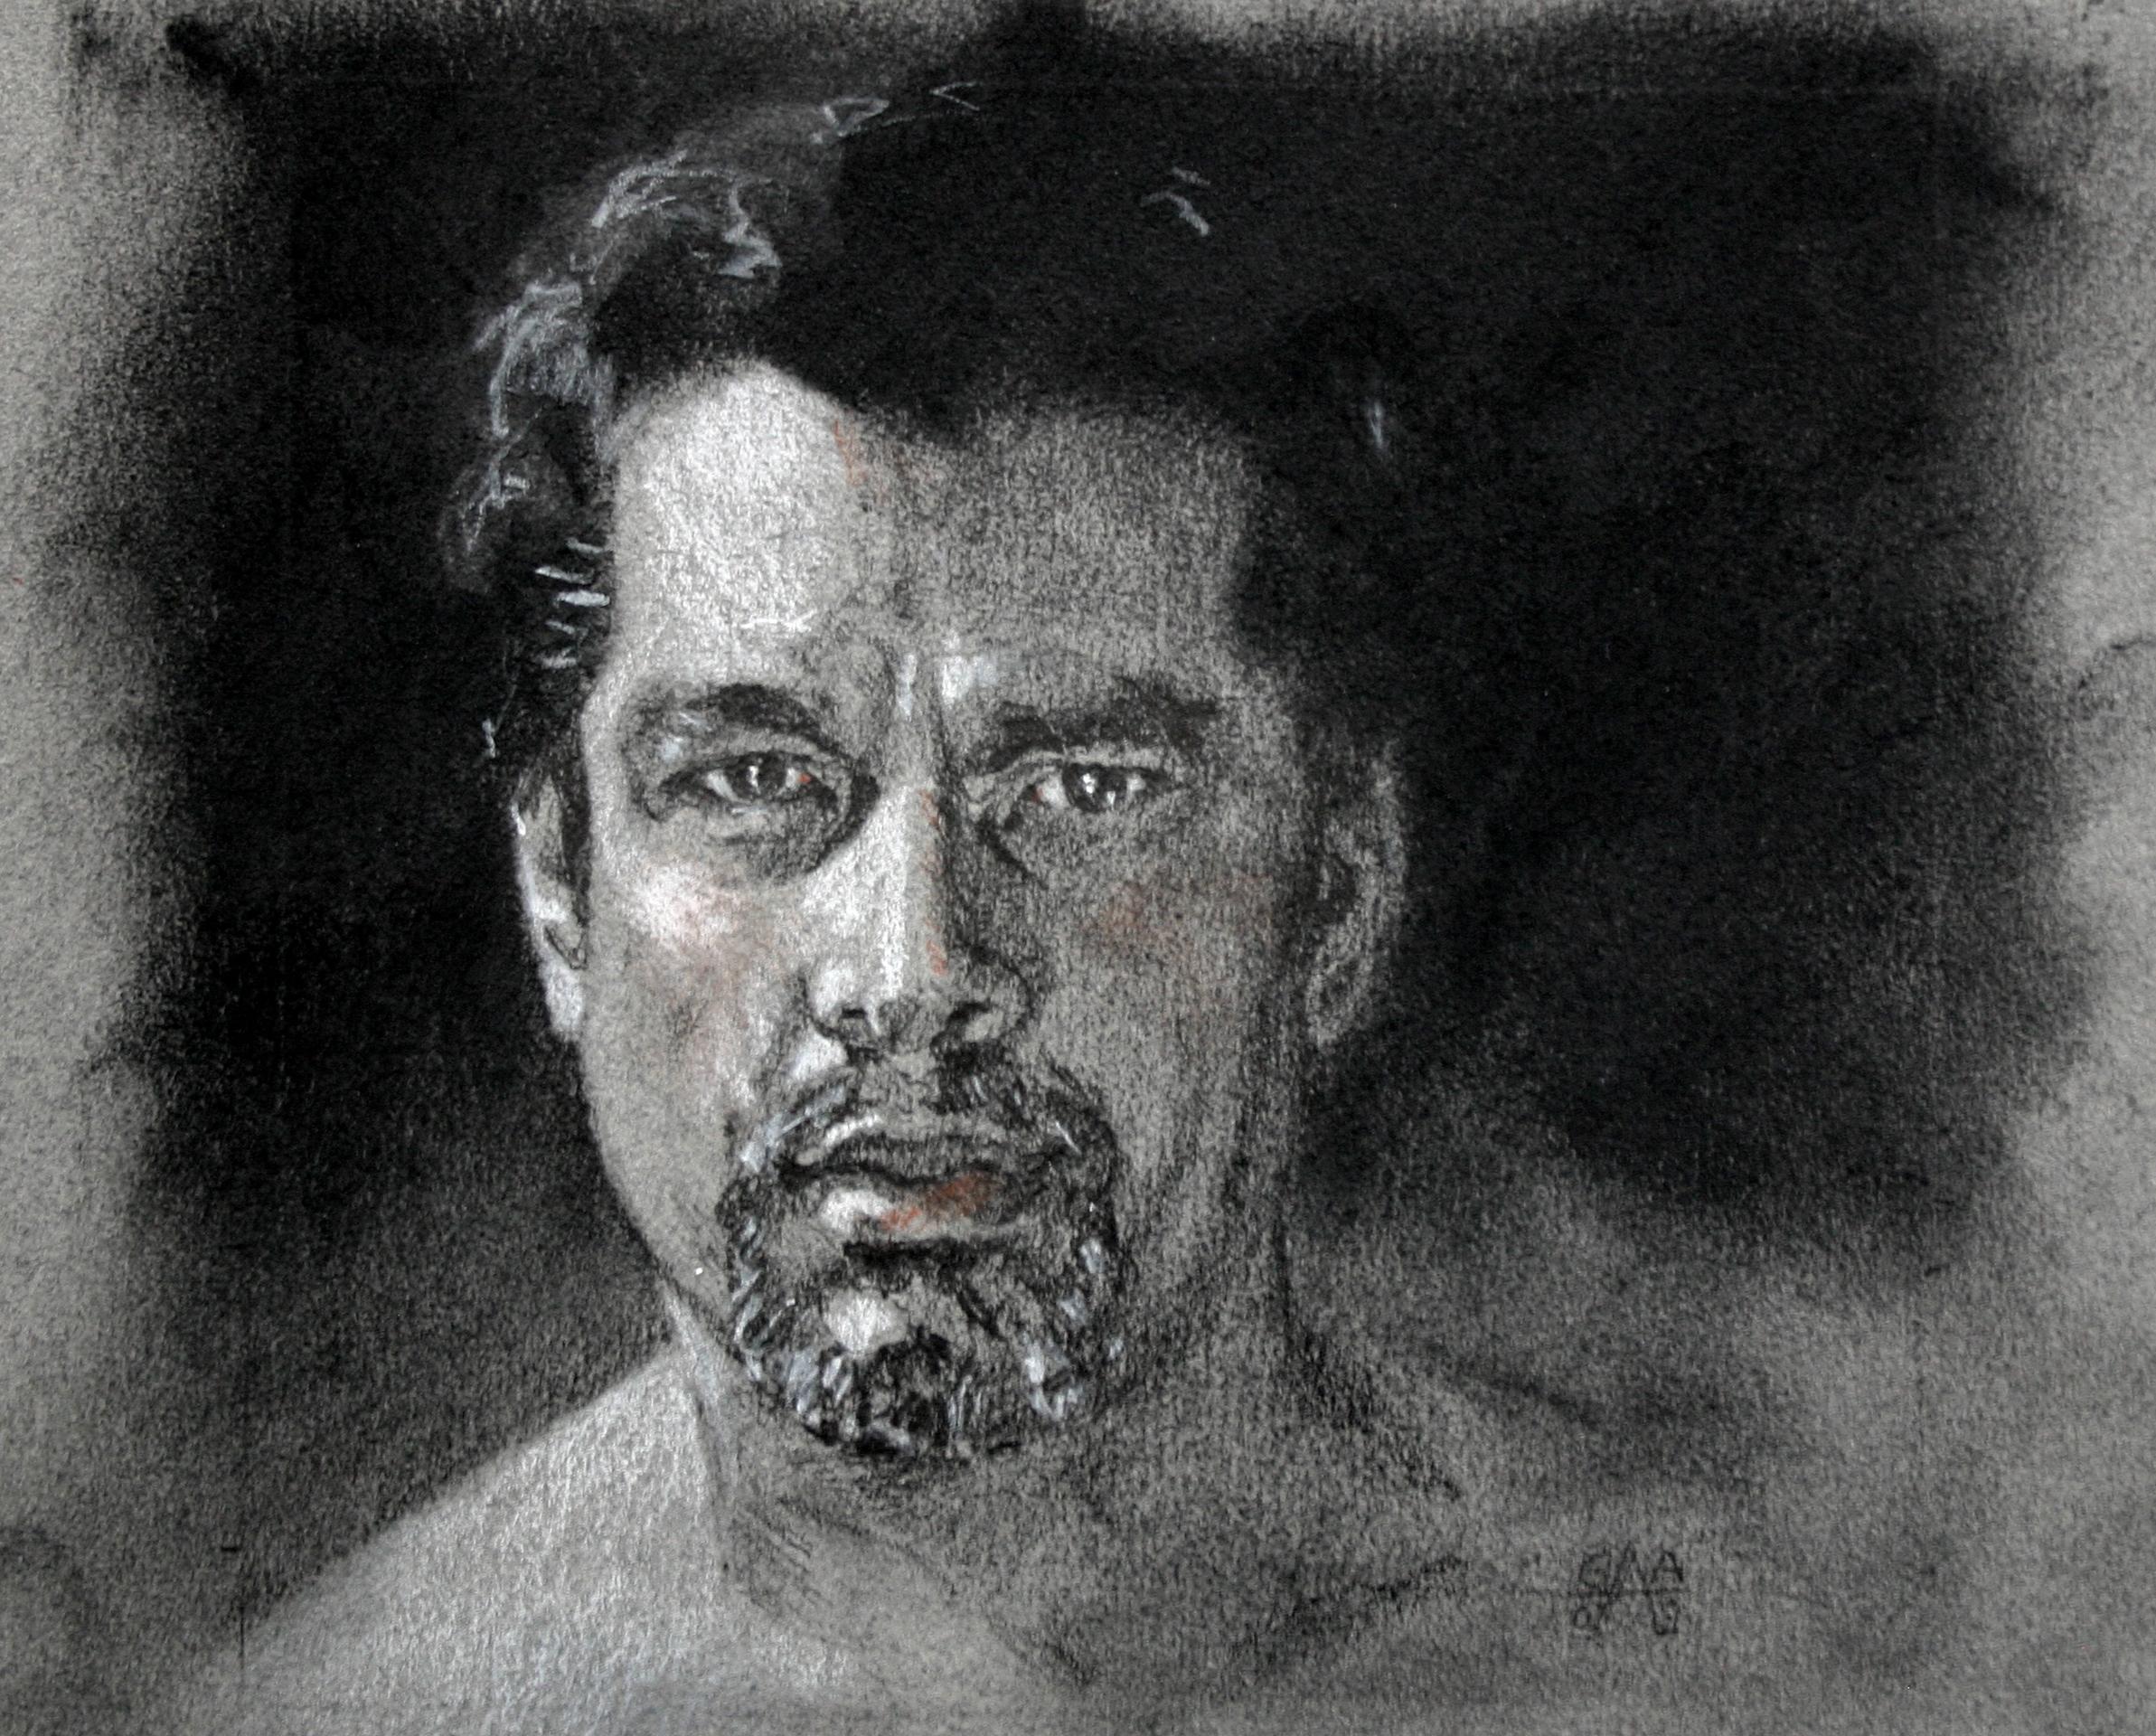 Bruno Graphite on Paper 8x6  SOLD